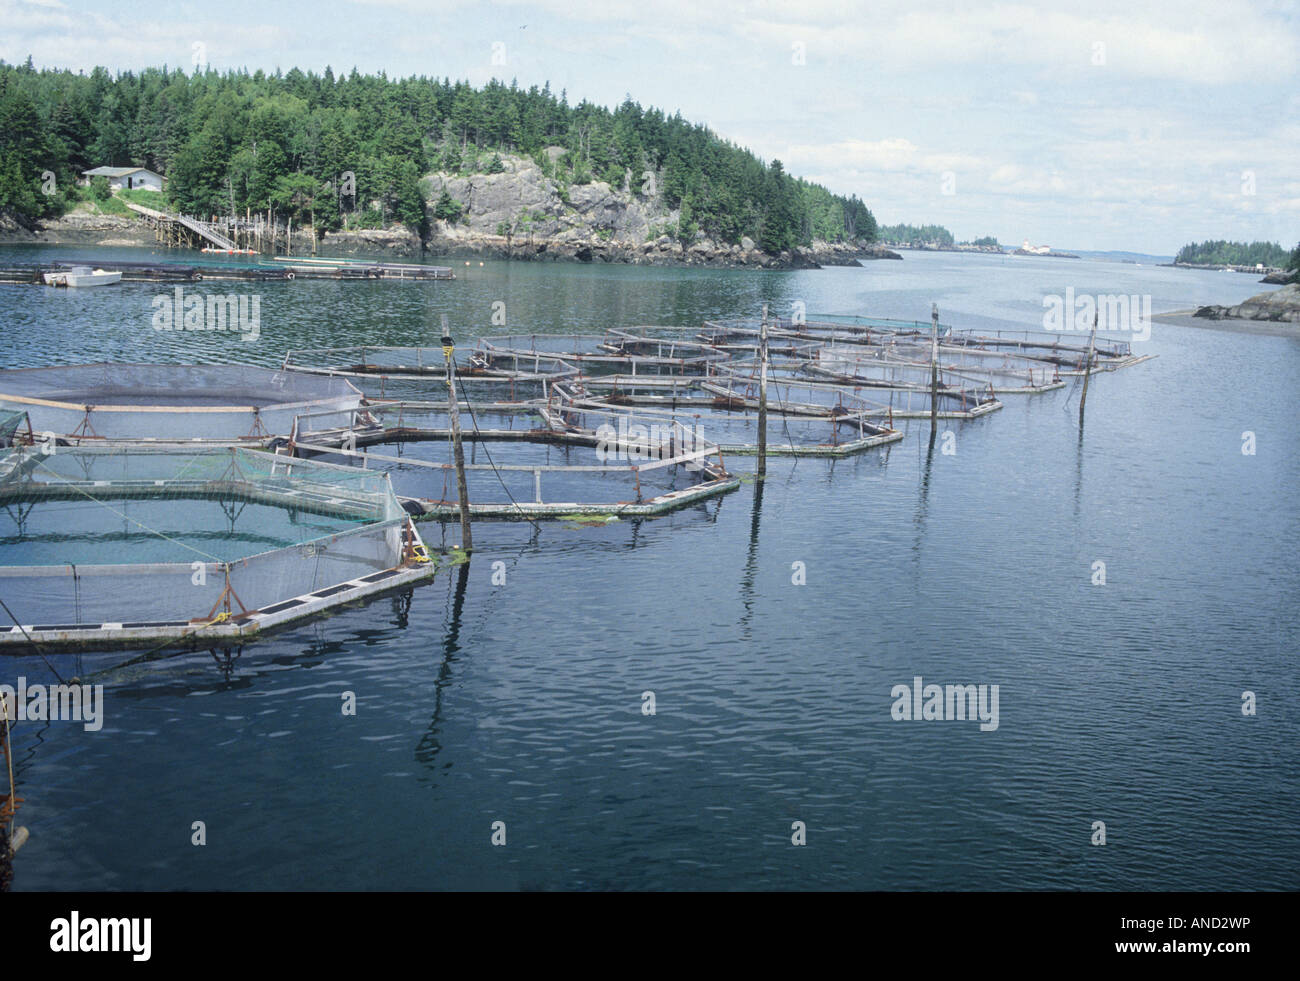 Saltwater salmon pens lubec maine usa atlantic ocean food for Saltwater fishing in maine